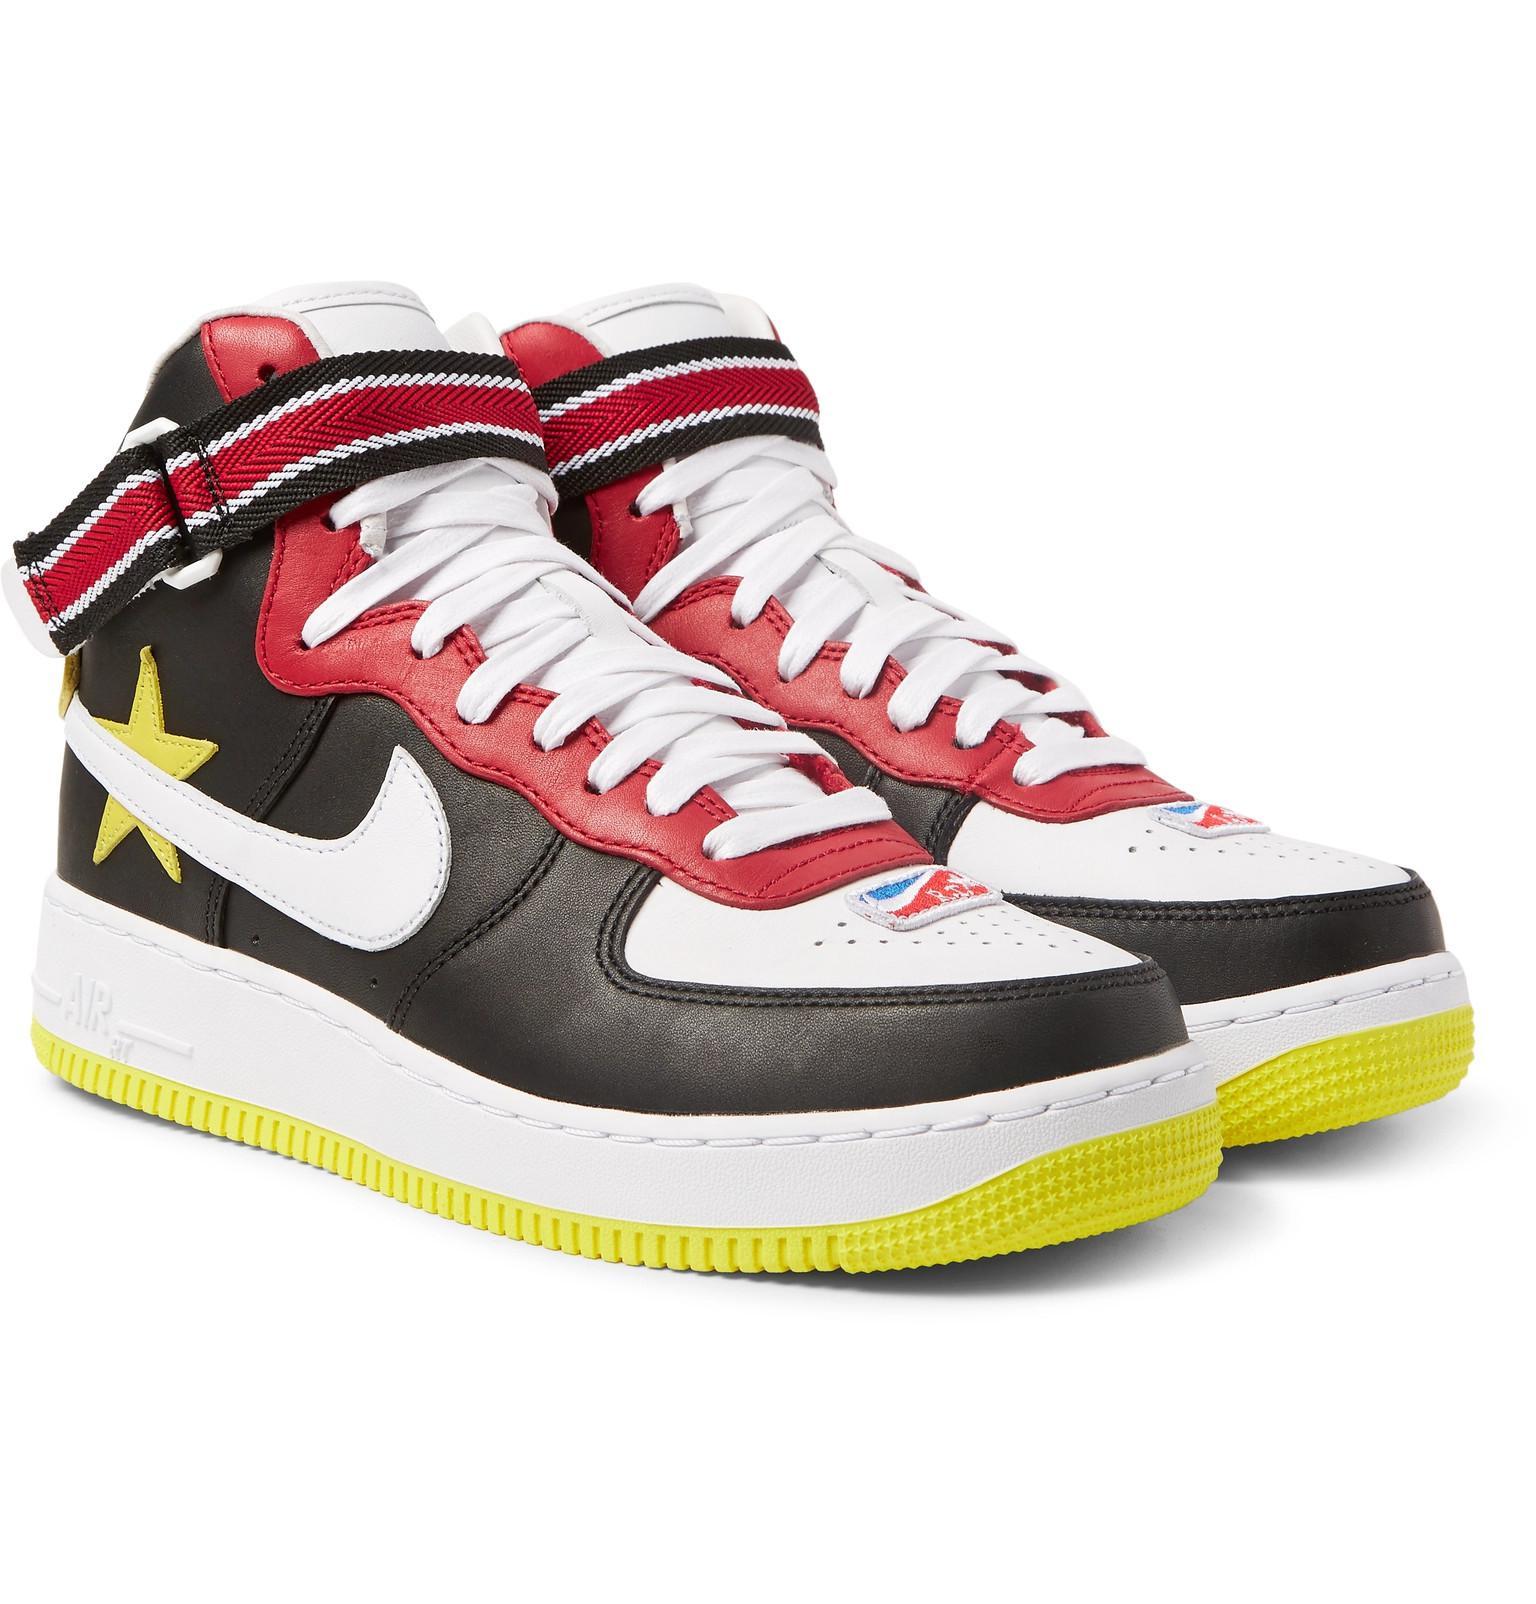 Nike. Men's Black + Riccardo Tisci Air Force 1 Leather High-top Sneakers